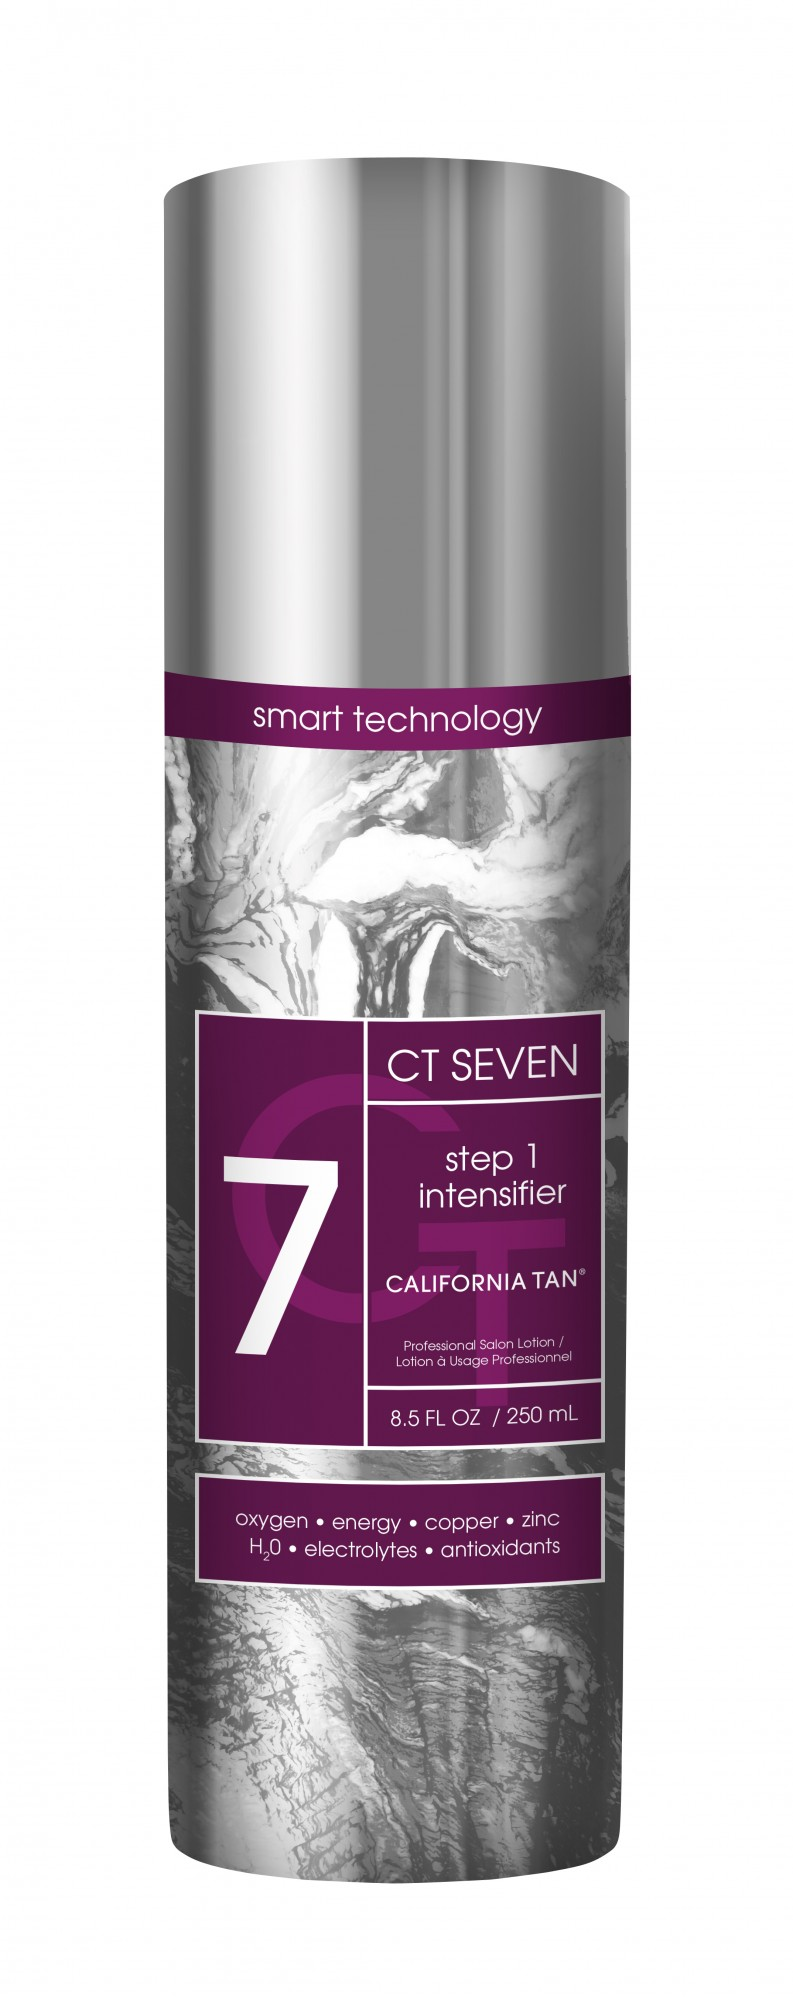 CT Seven Intensifier Step 1